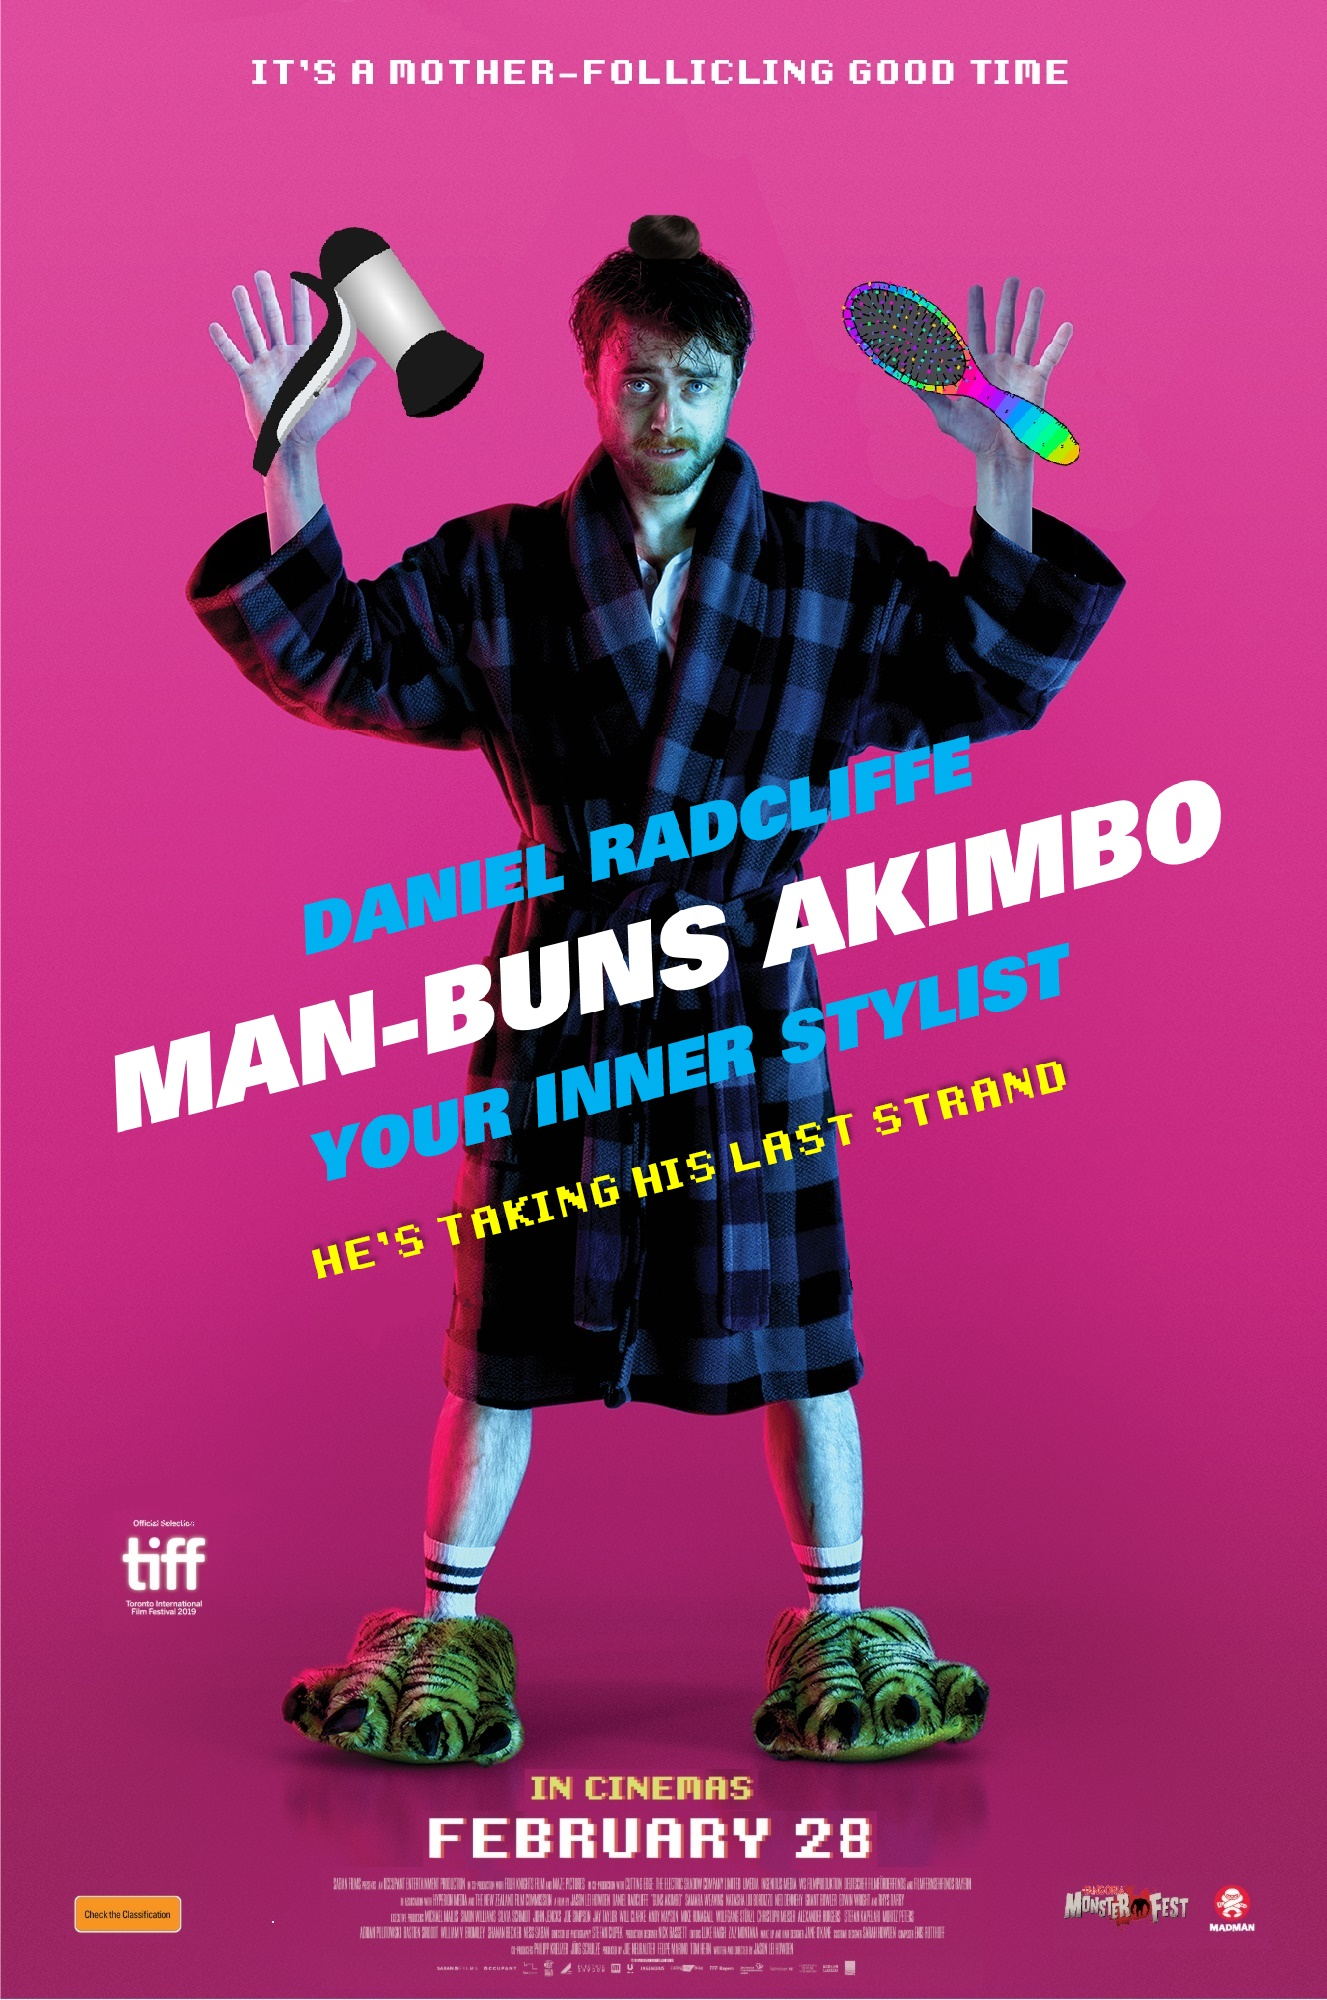 Hands-Akimbo Final